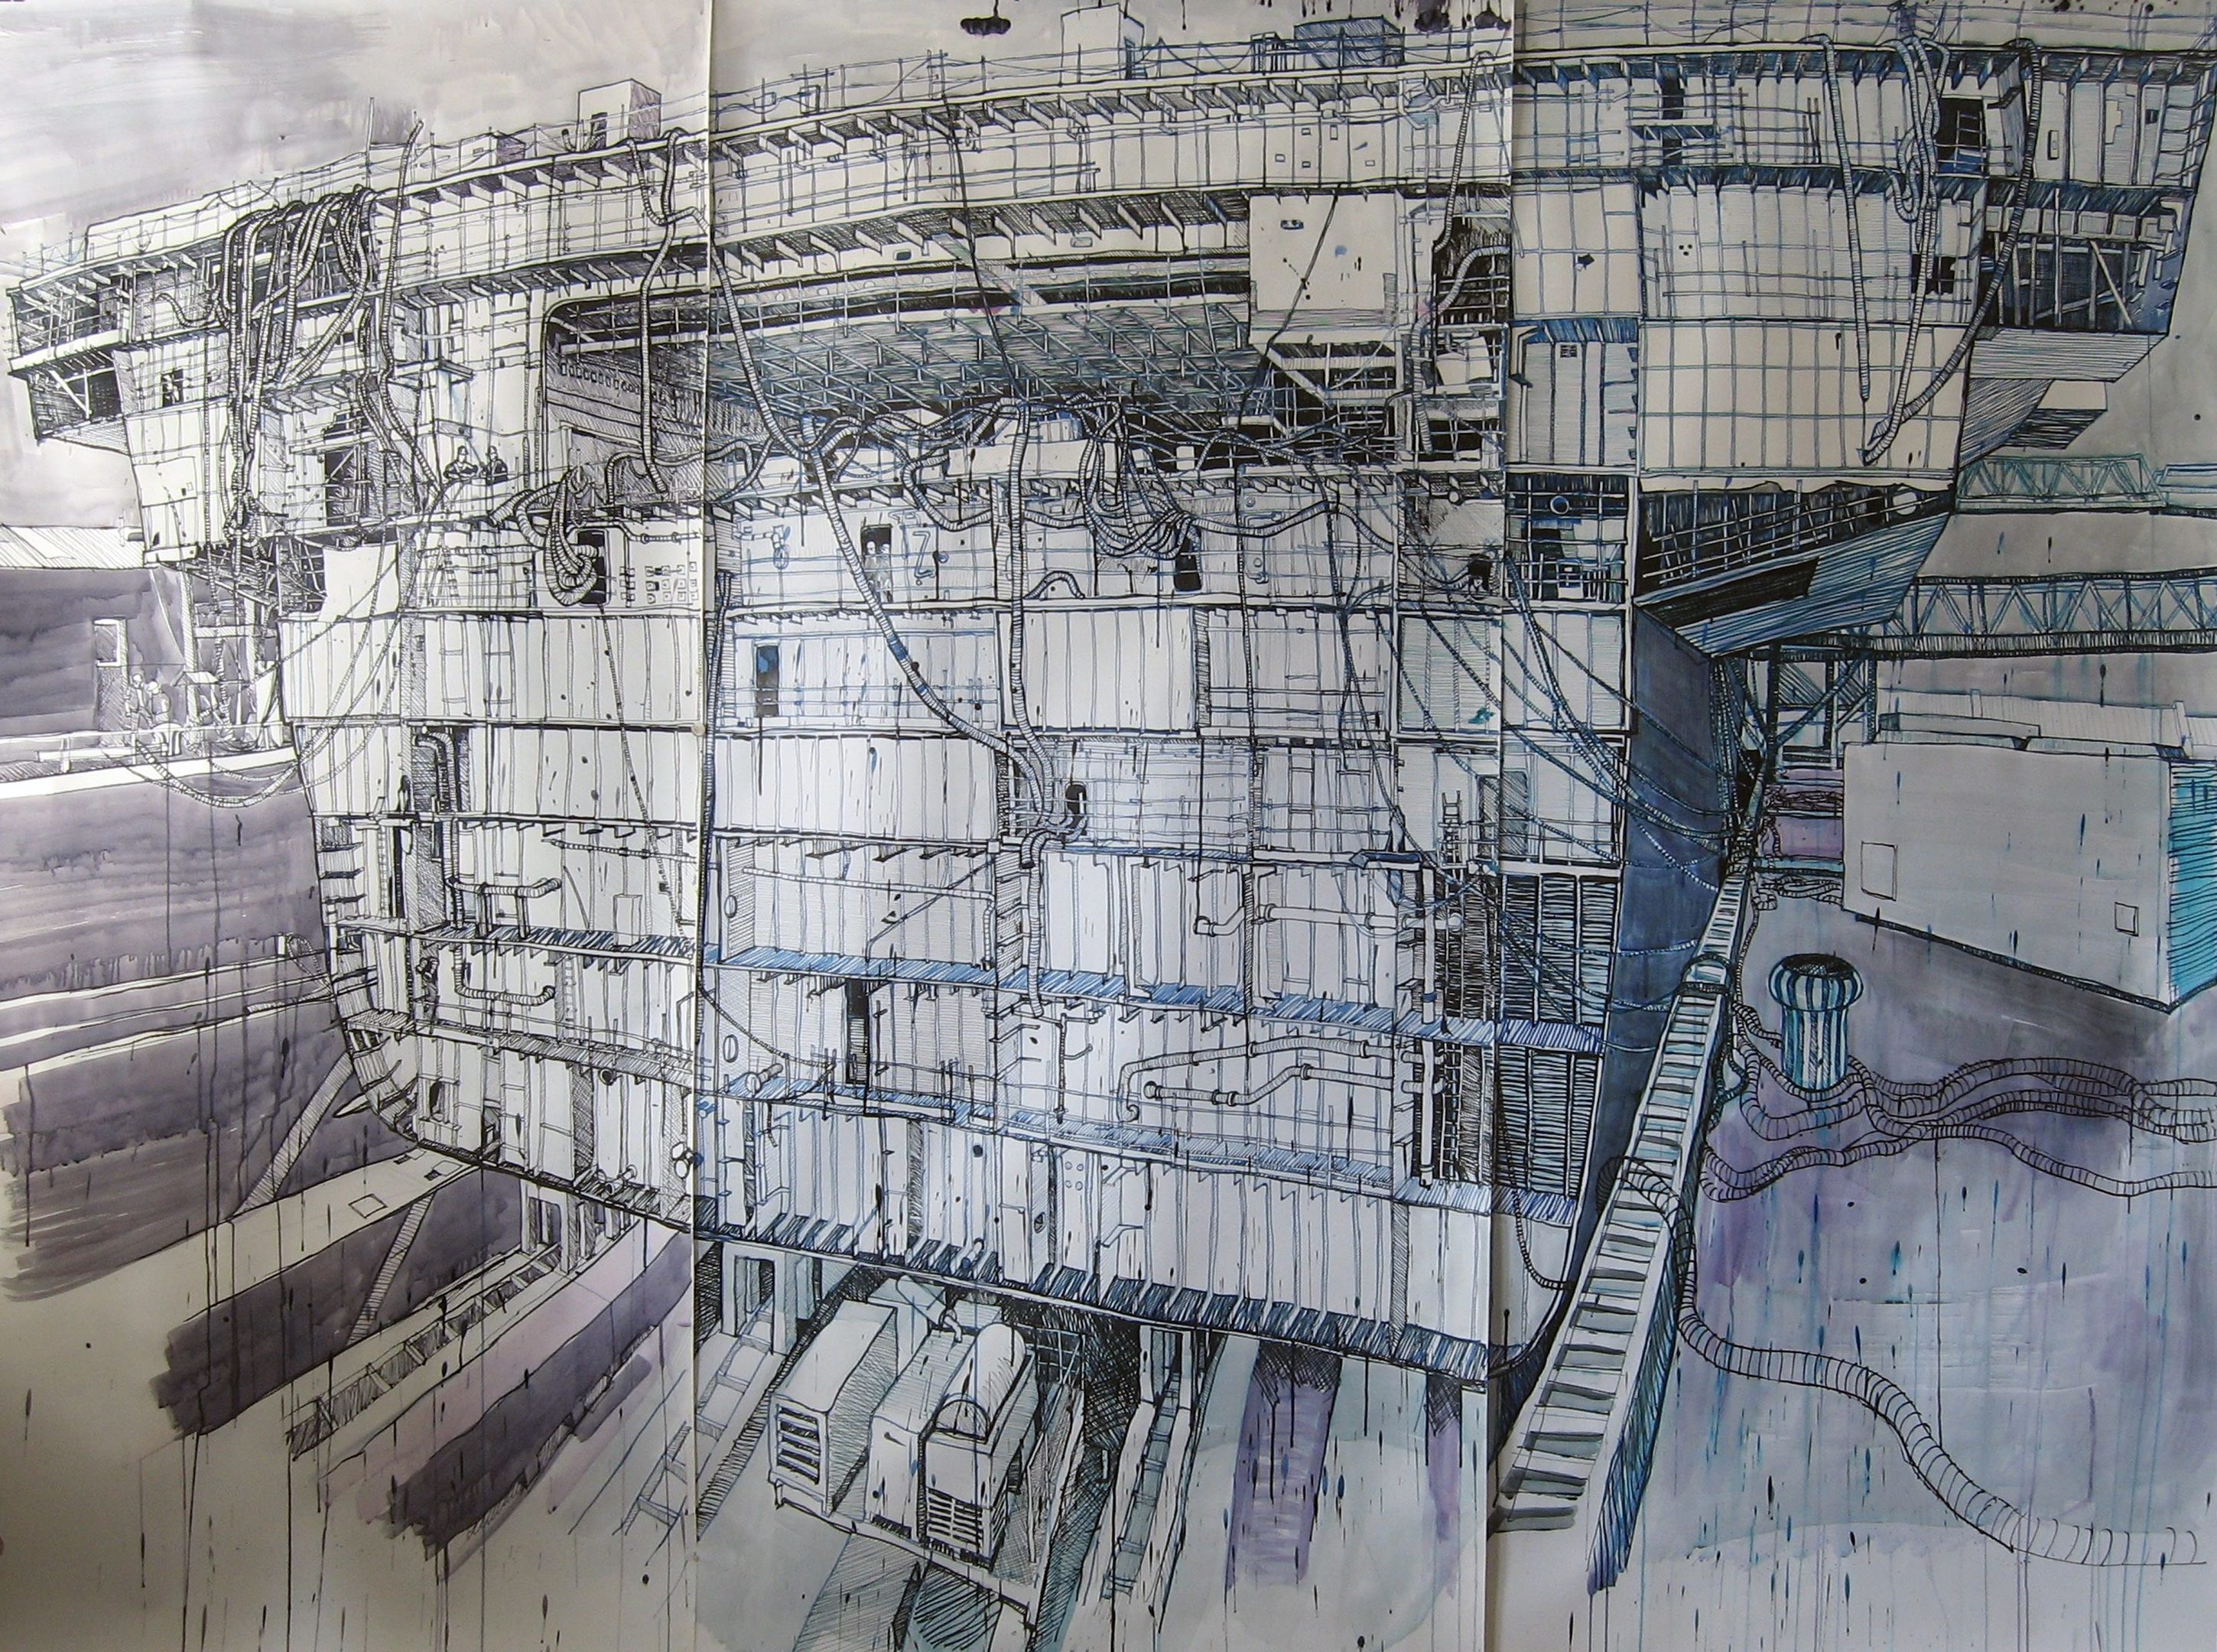 Goudie Shipyard